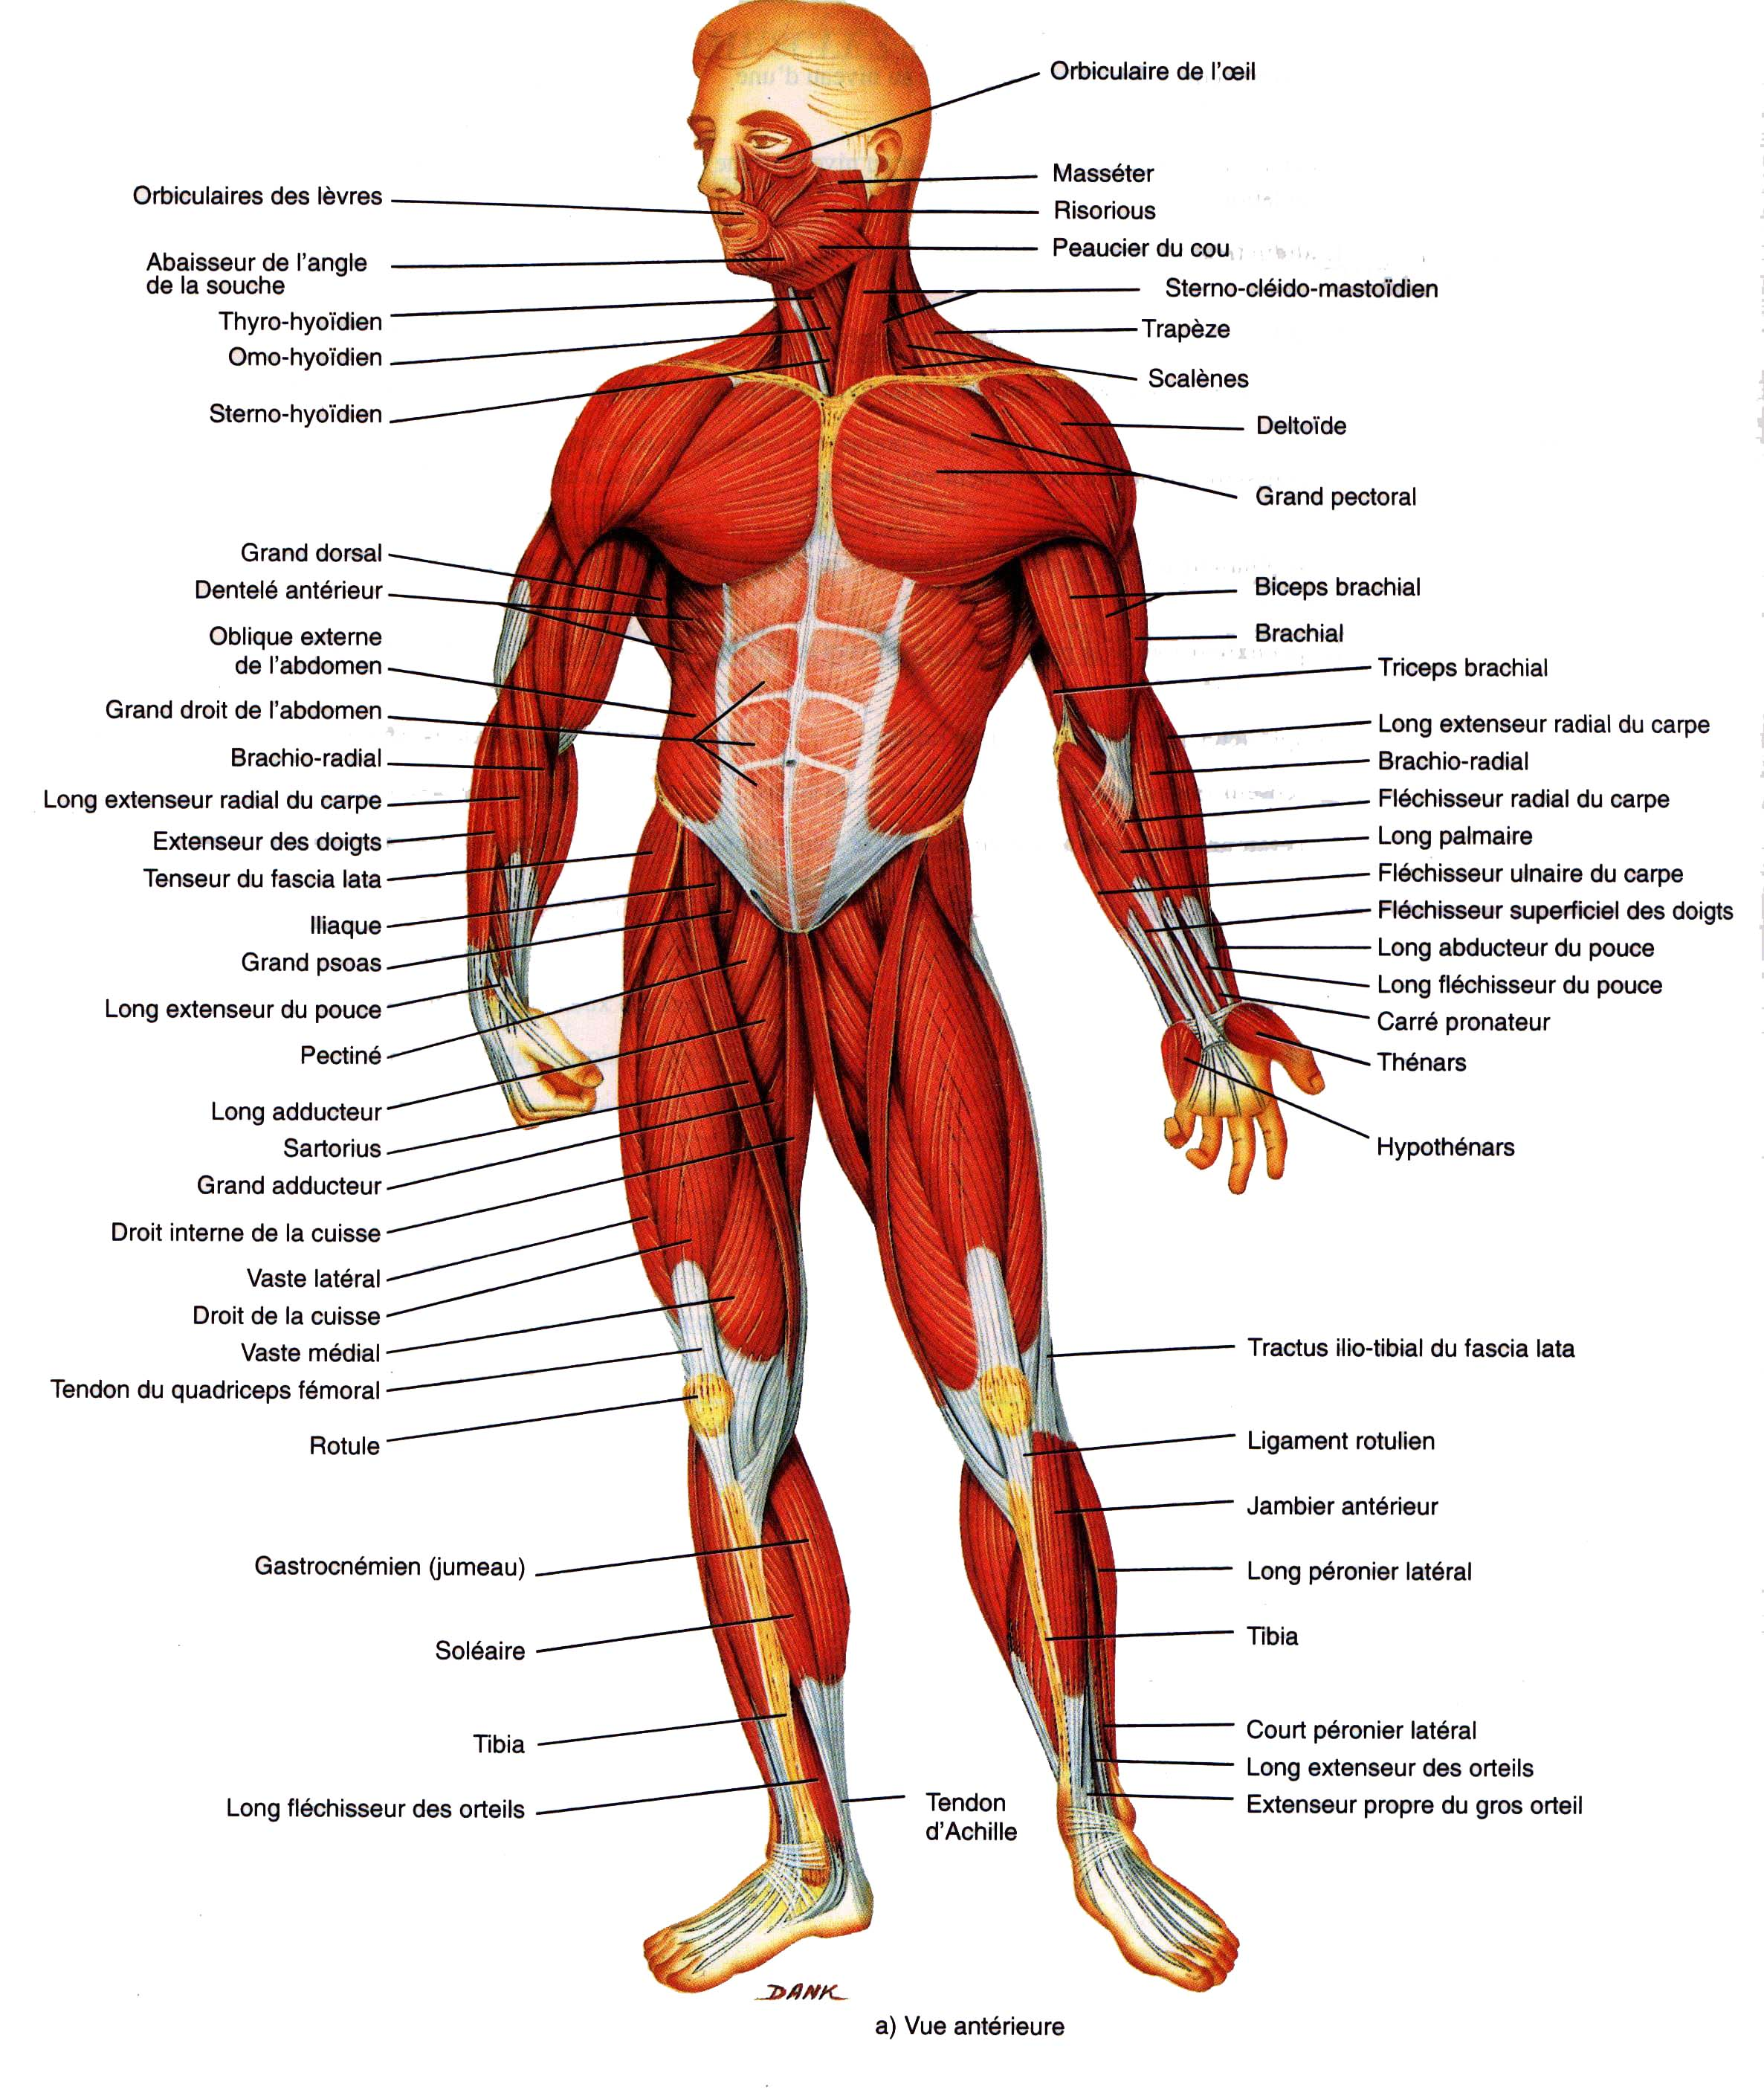 Anatomie Image anatomie - jirufeke76.over-blog